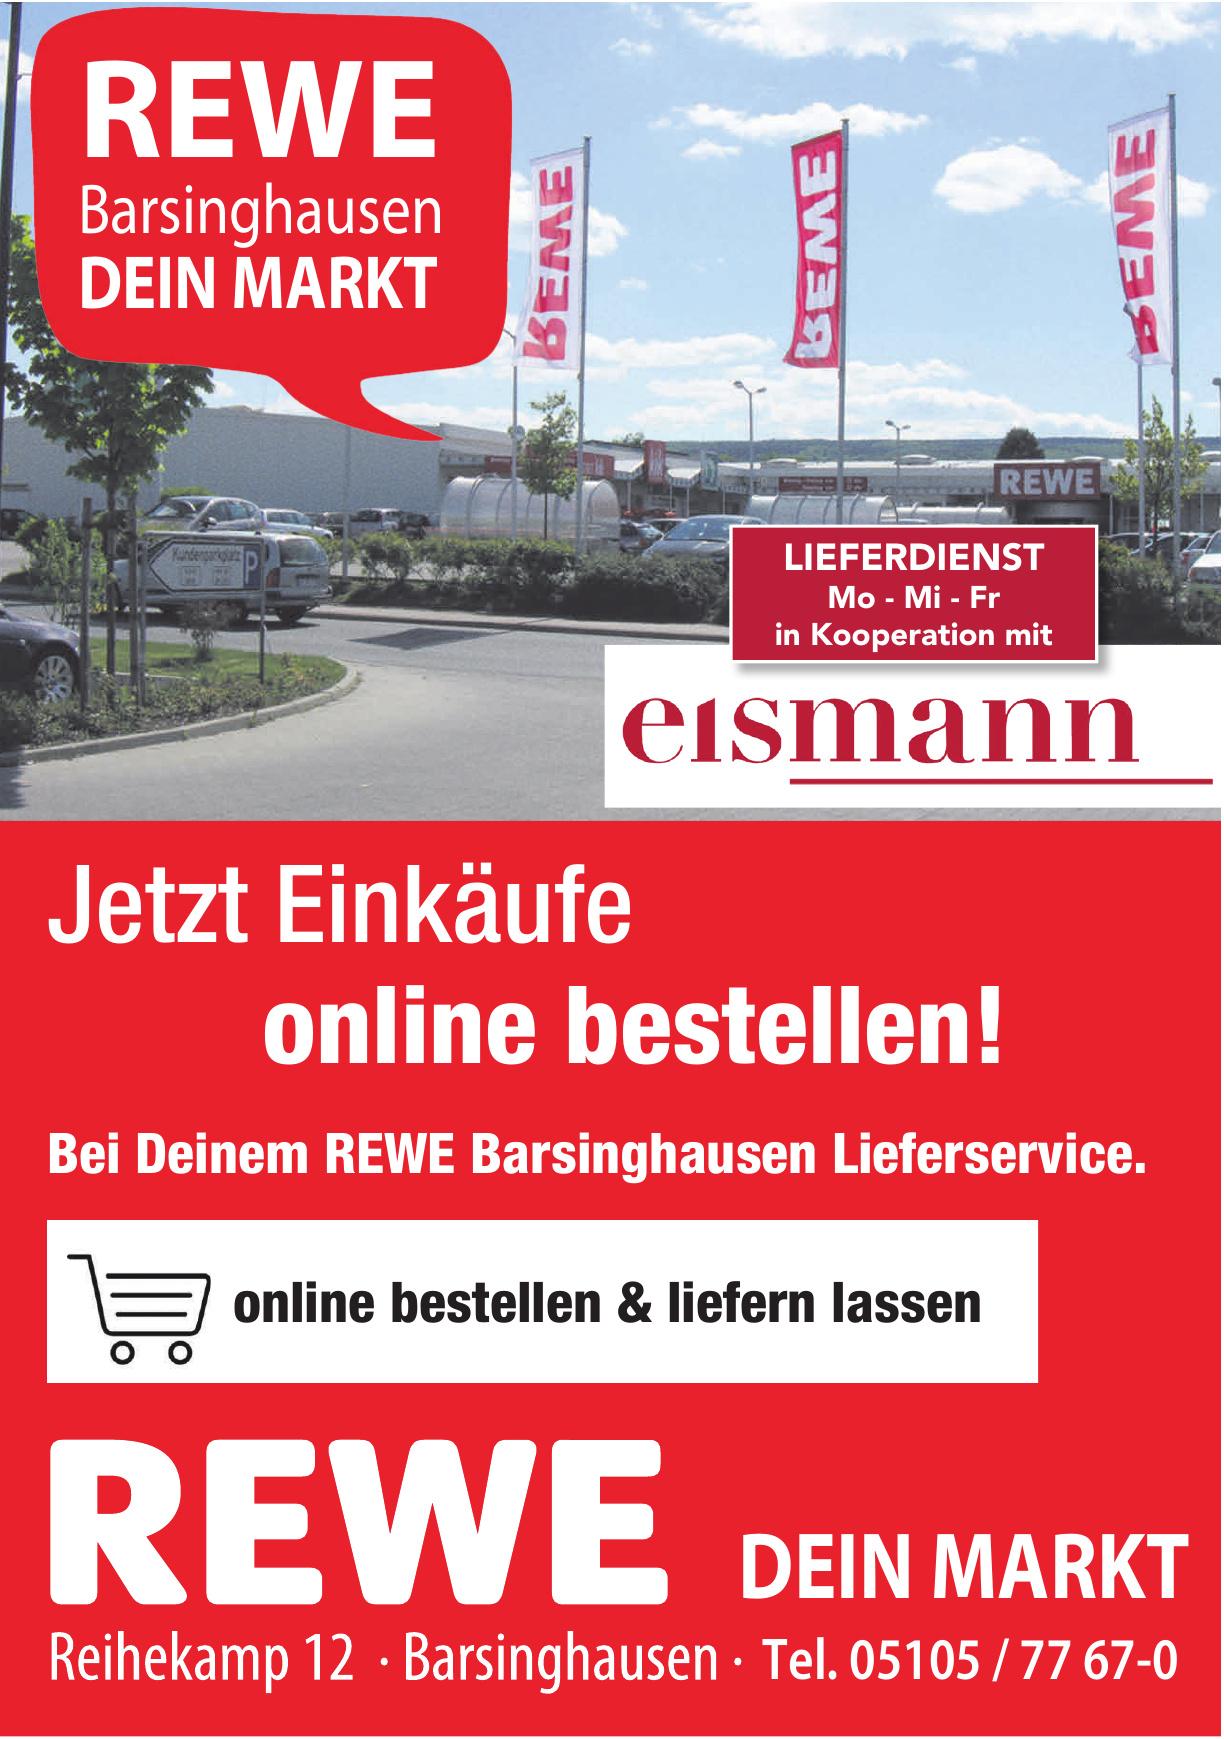 REWE Barsinghausen